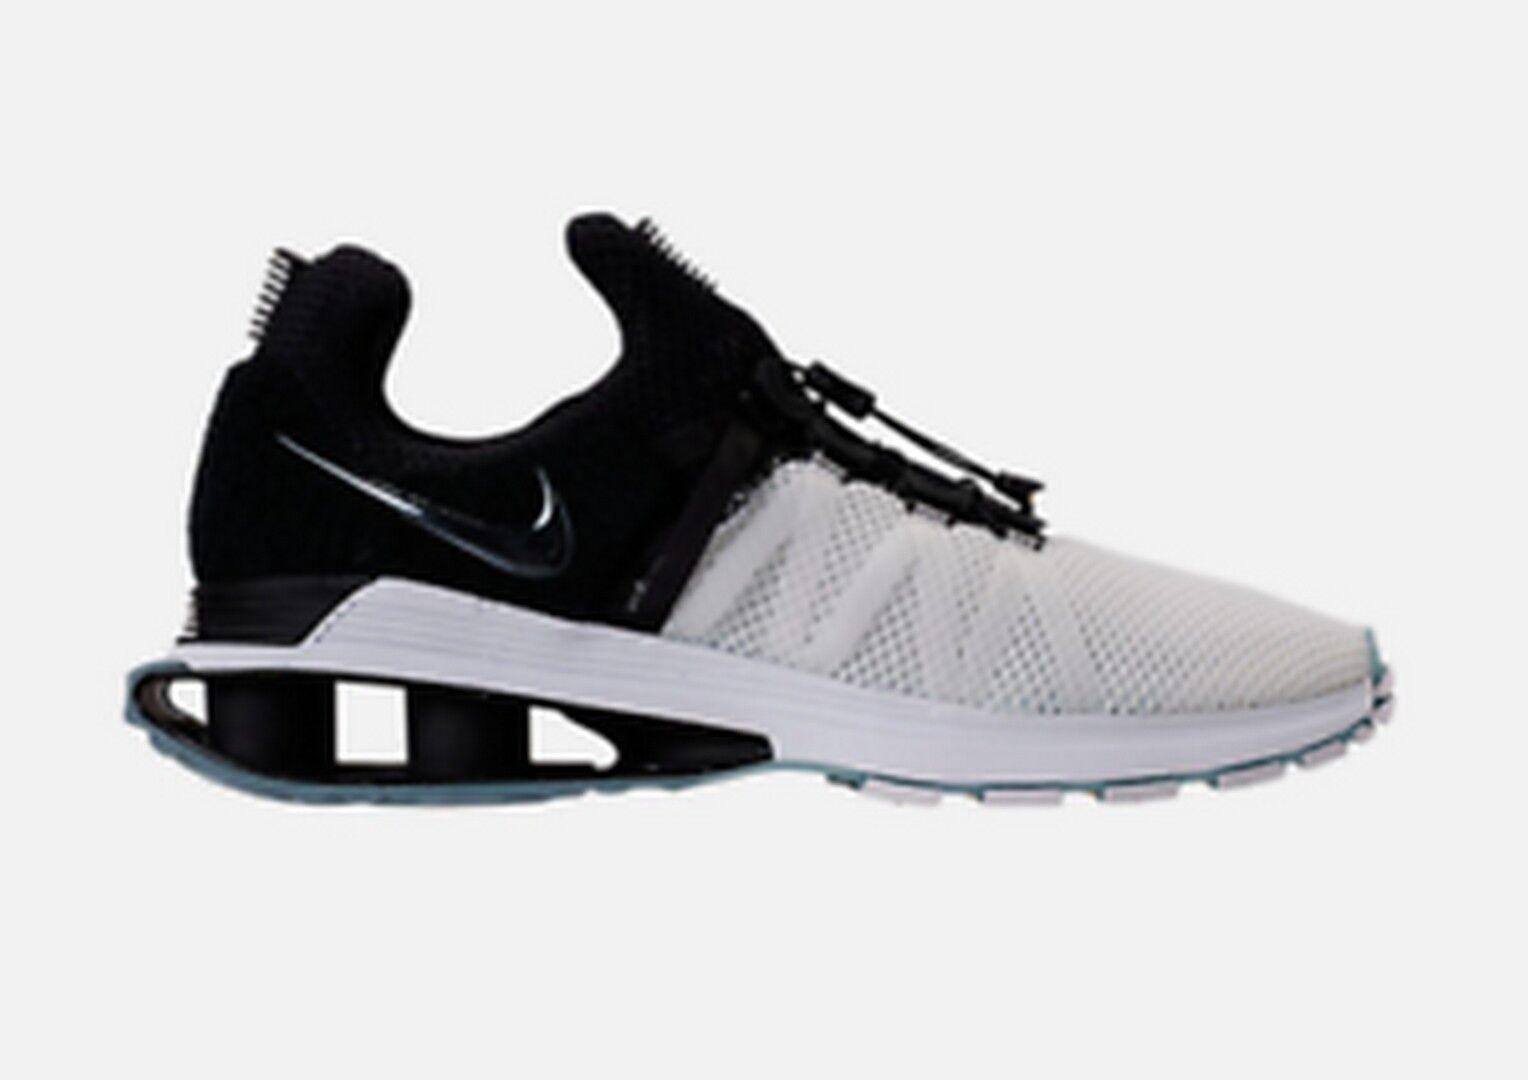 Nike Shox Gravity Black White AR1999-101 Running shoes Men's - - - Size 10 efa445